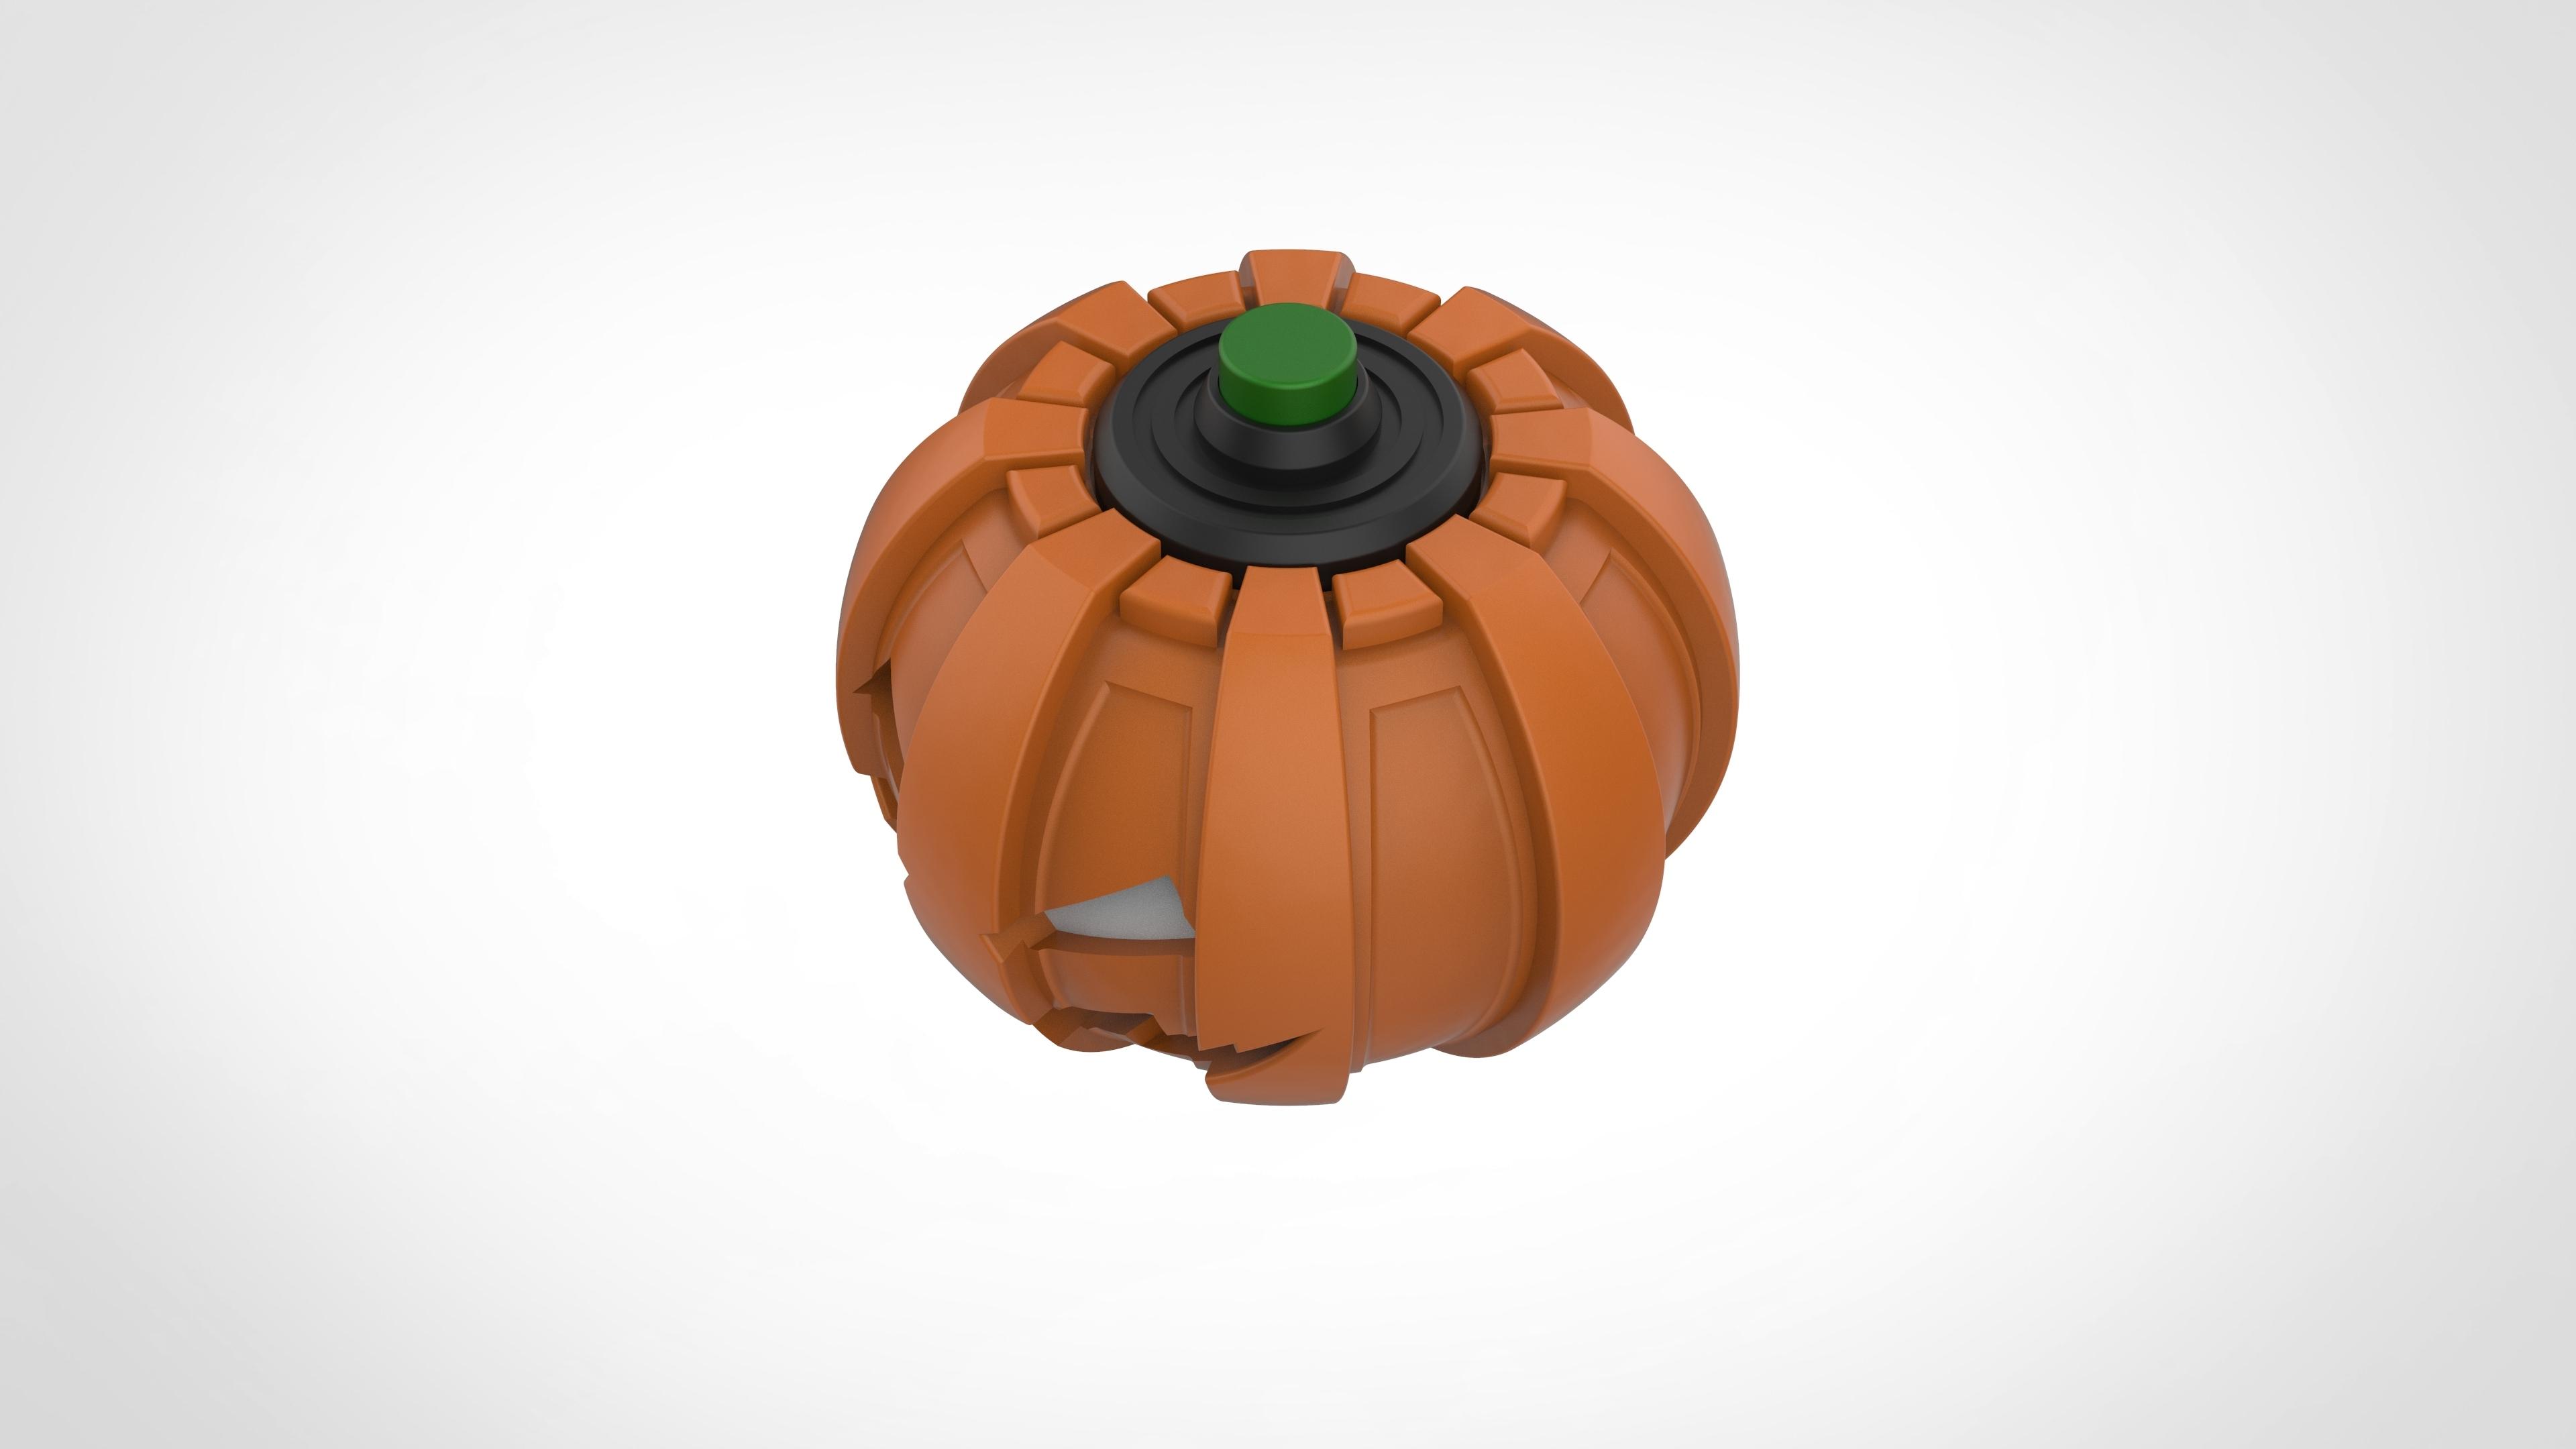 003.jpg Download 3MF file Green goblin bombs from the Spide-Man comics • 3D print model, vetrock